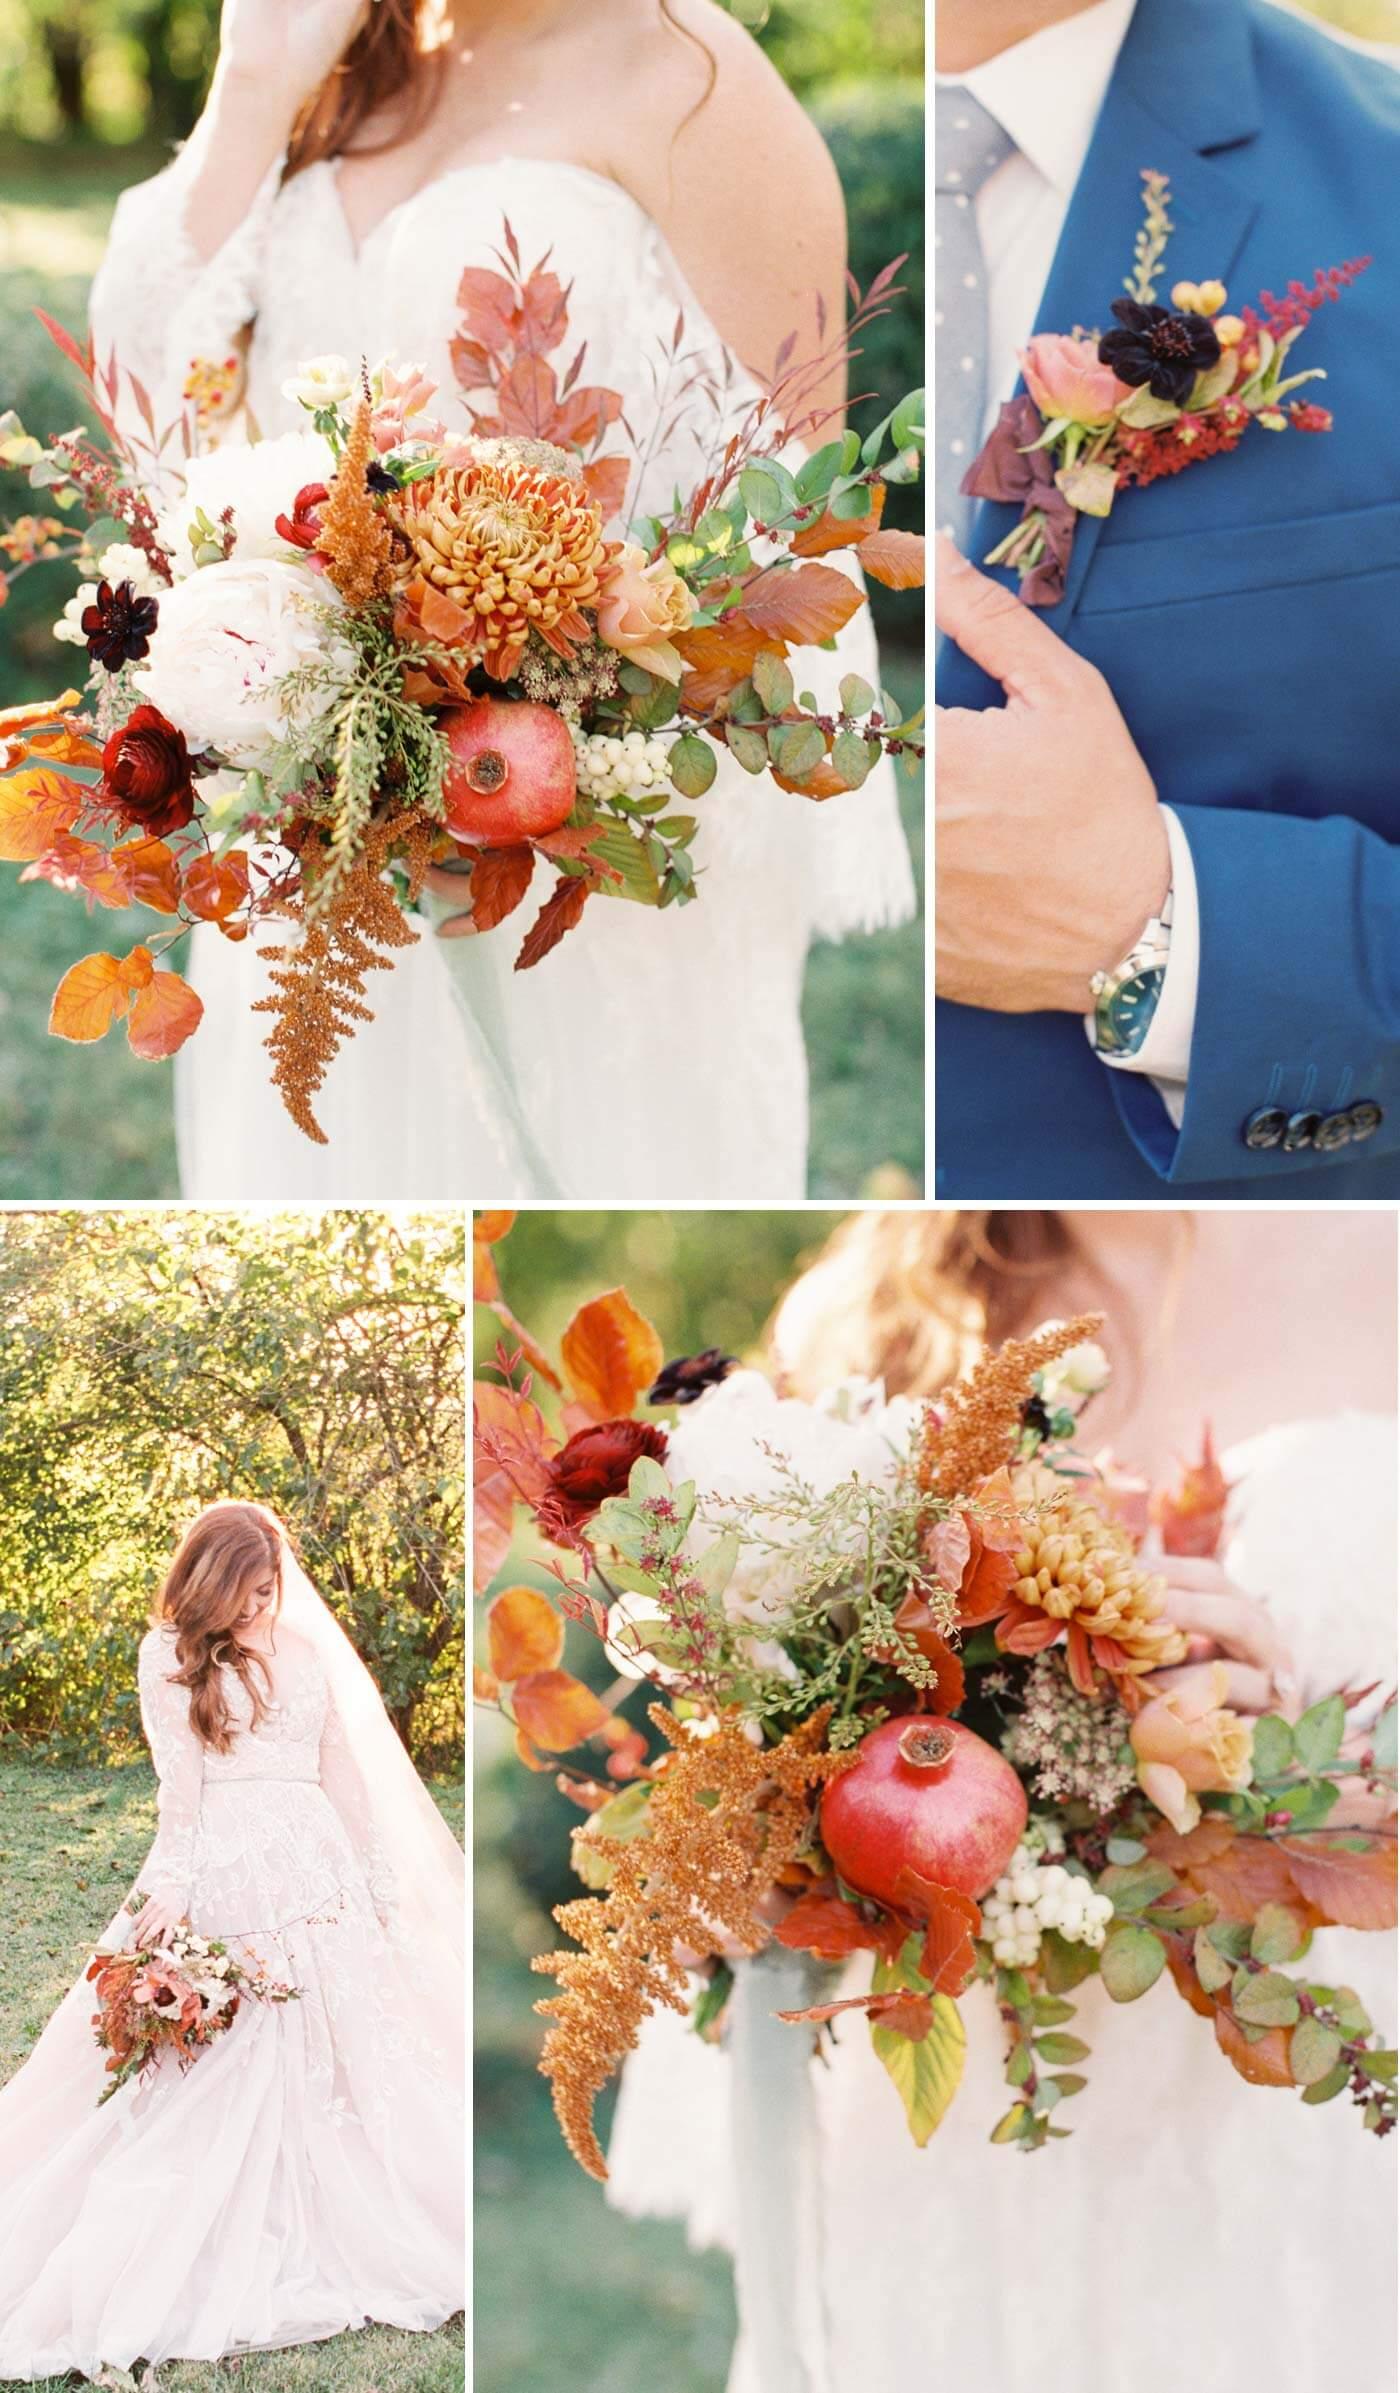 Herbst Brautstrauß Granatapfel